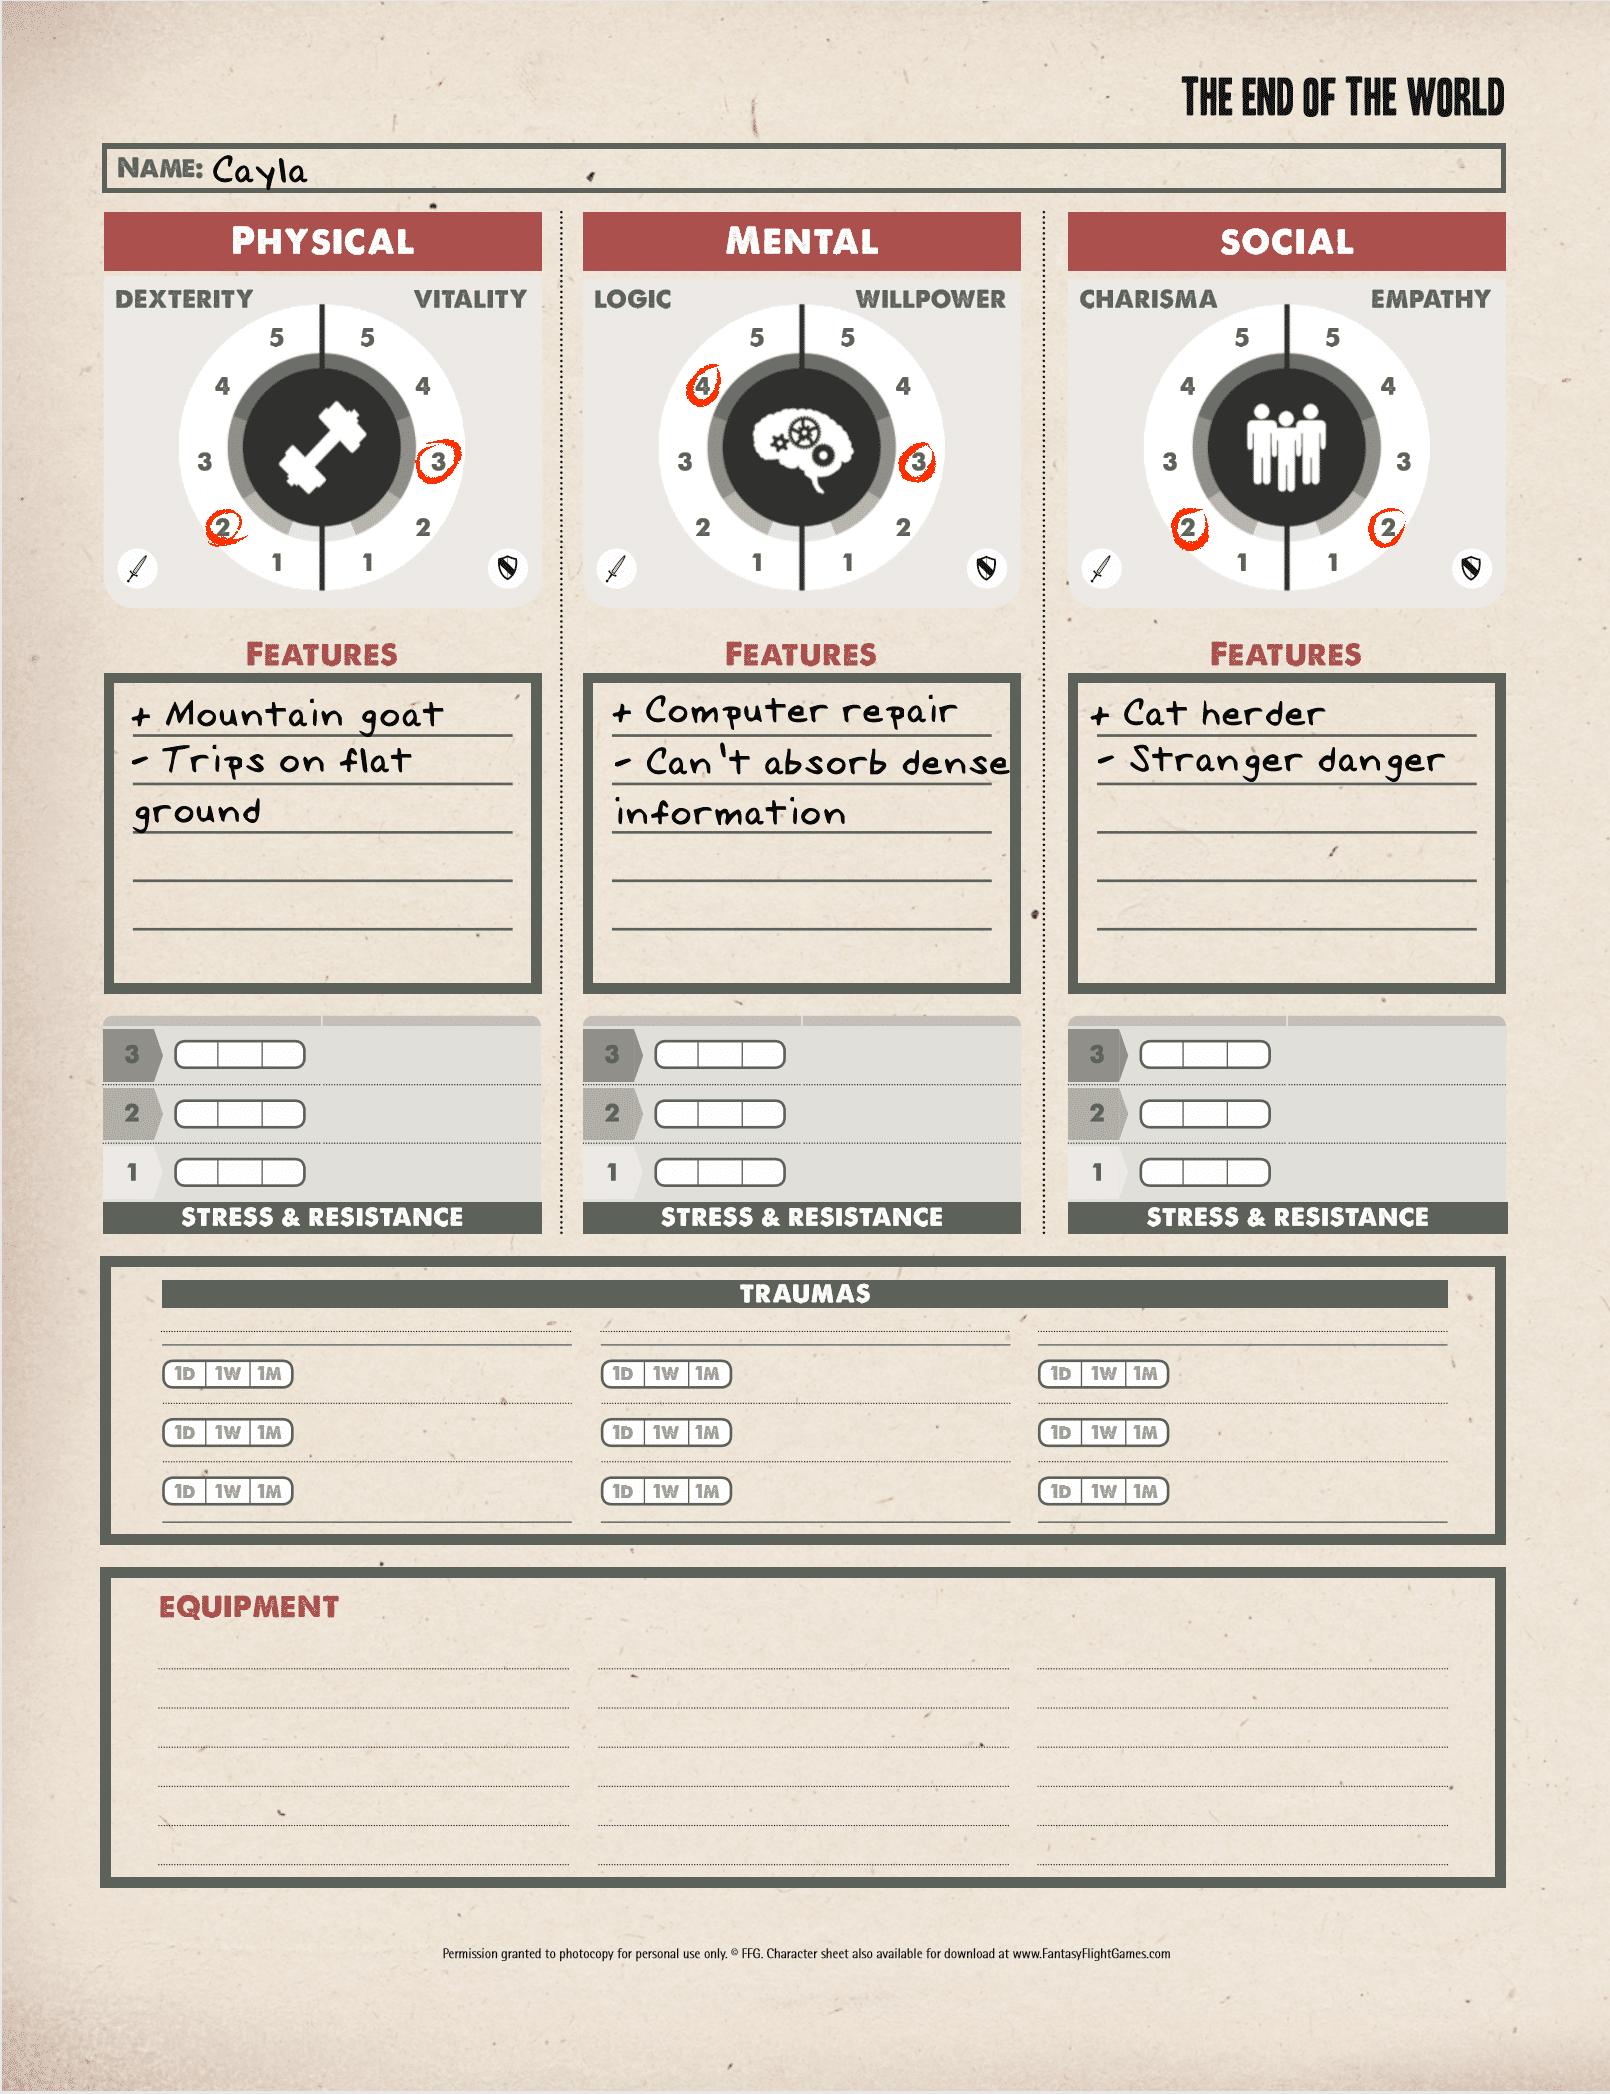 Character Sheet - Cayla